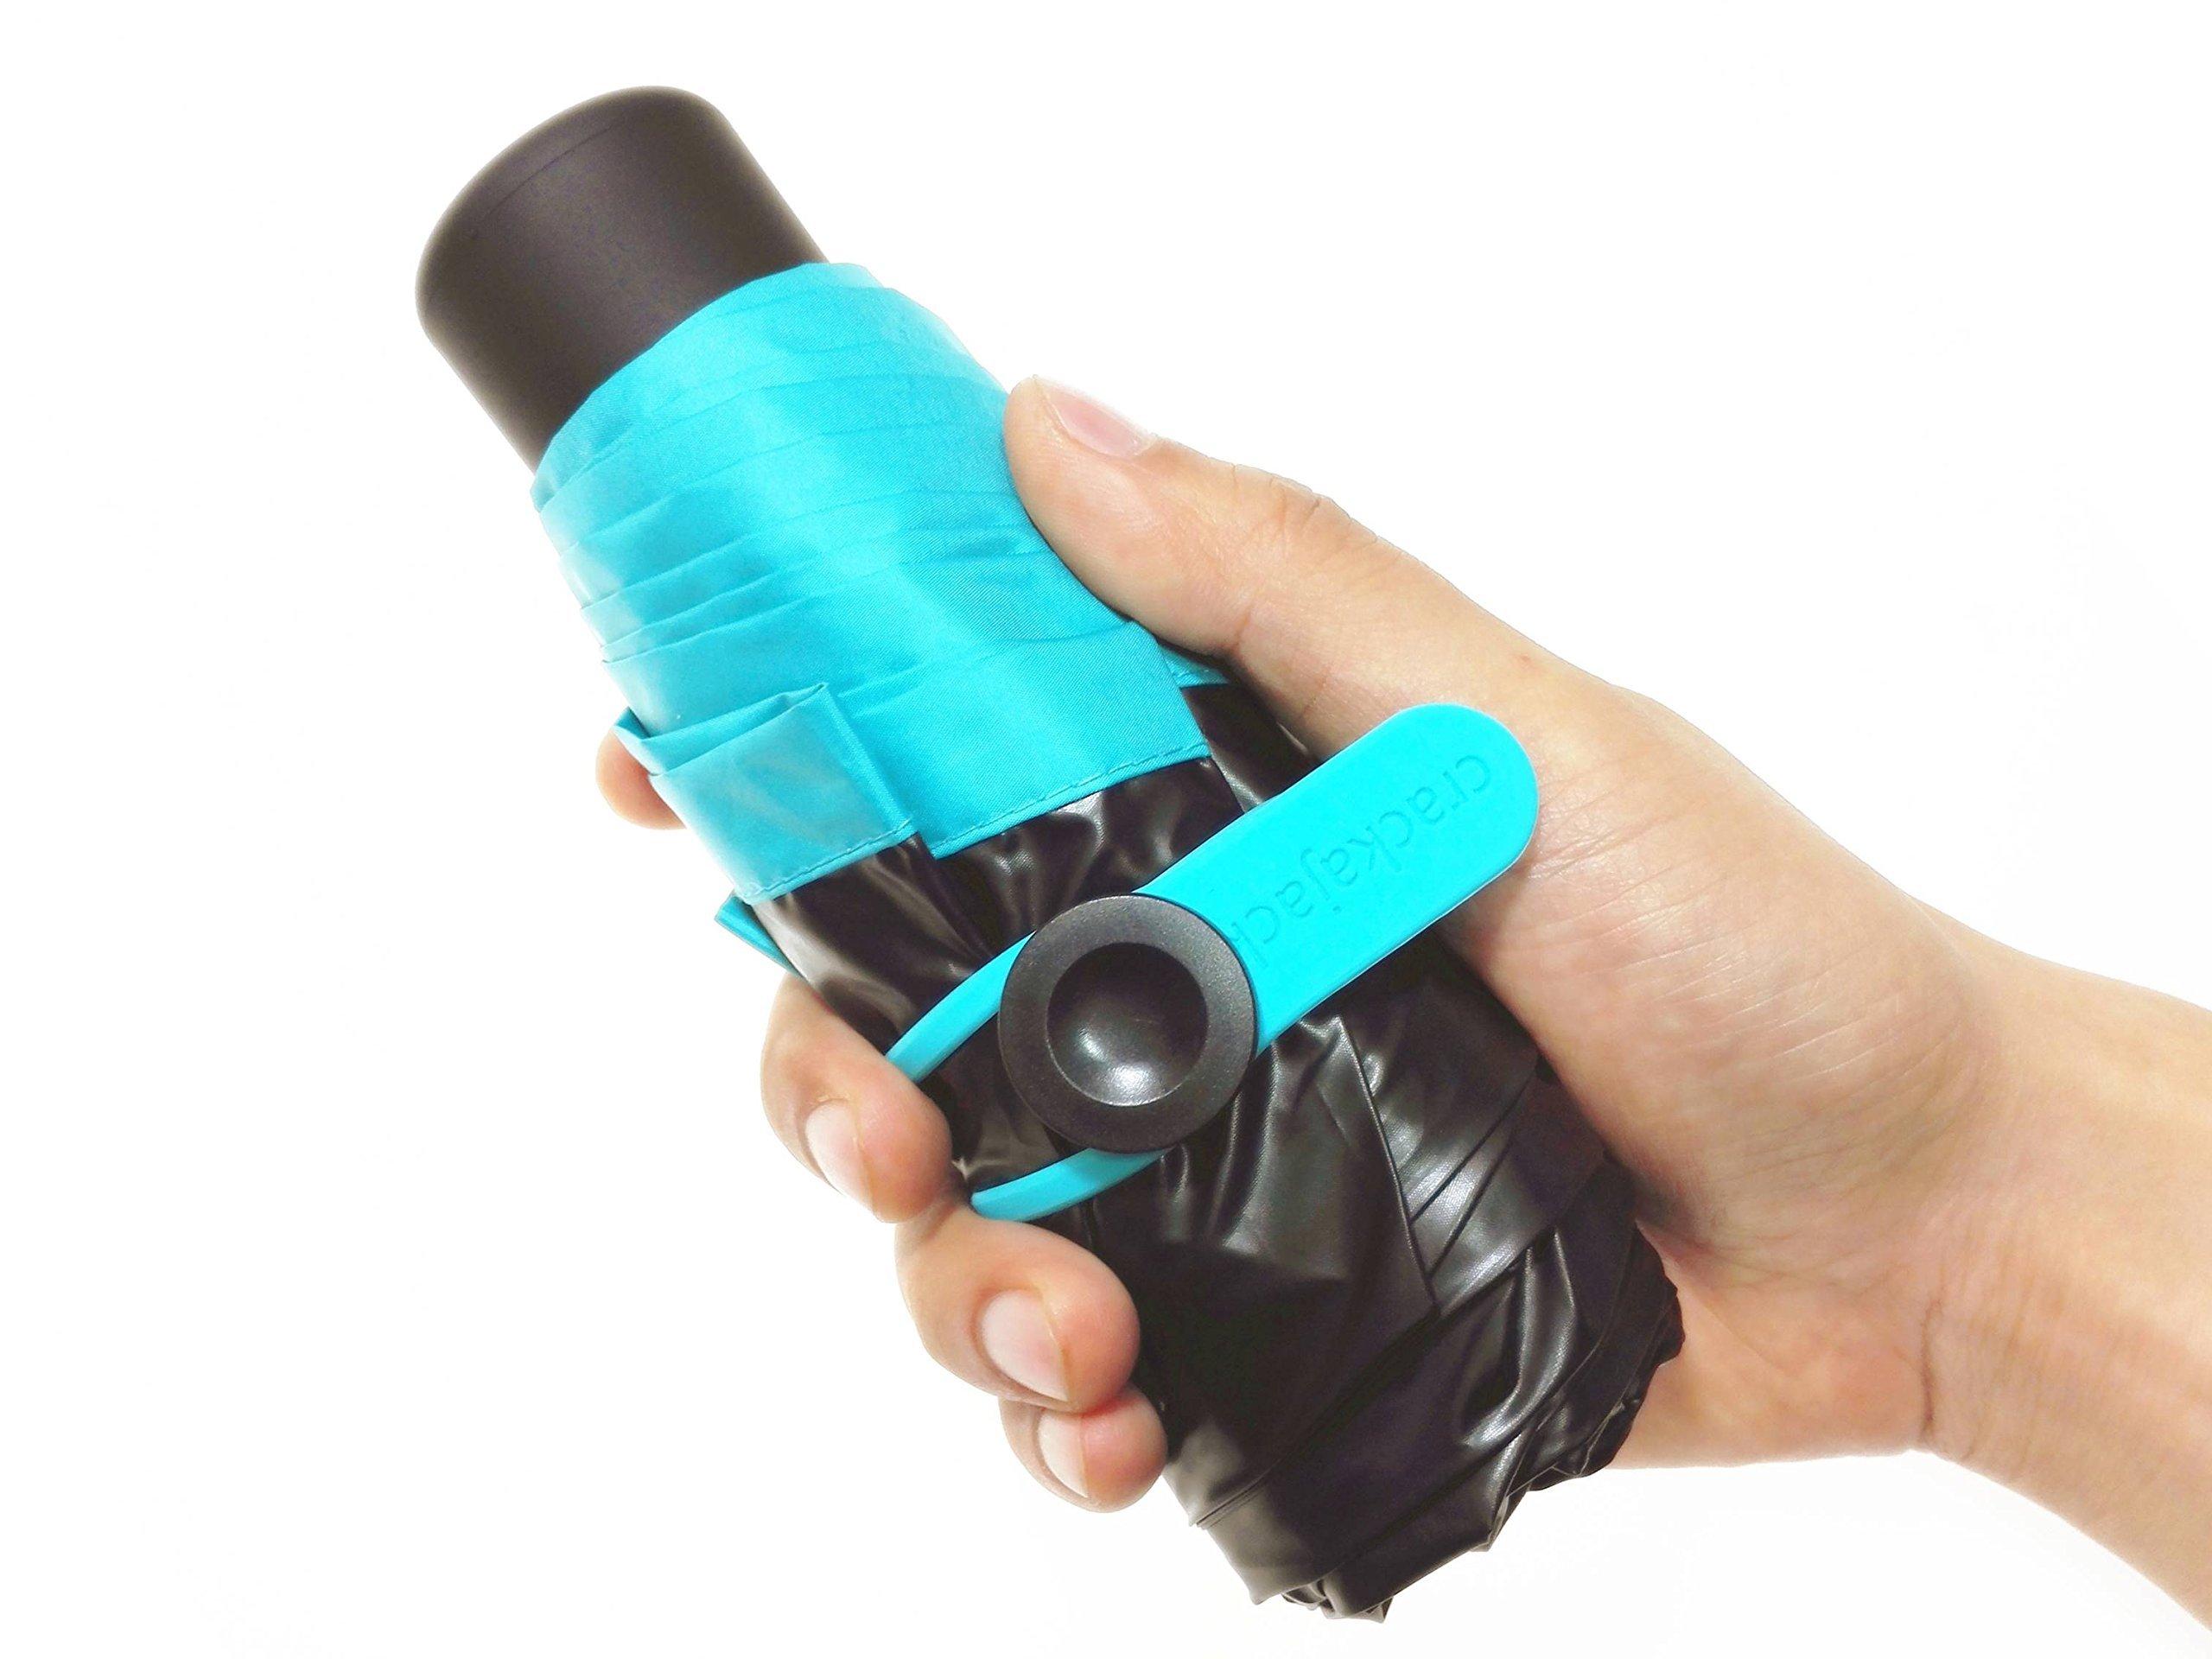 crackajack Mini Travel Portable Compact UV Protective Folding Umbrella Parasol for Sun Rain Backpack Purse Pocket Women (Blue Rim)